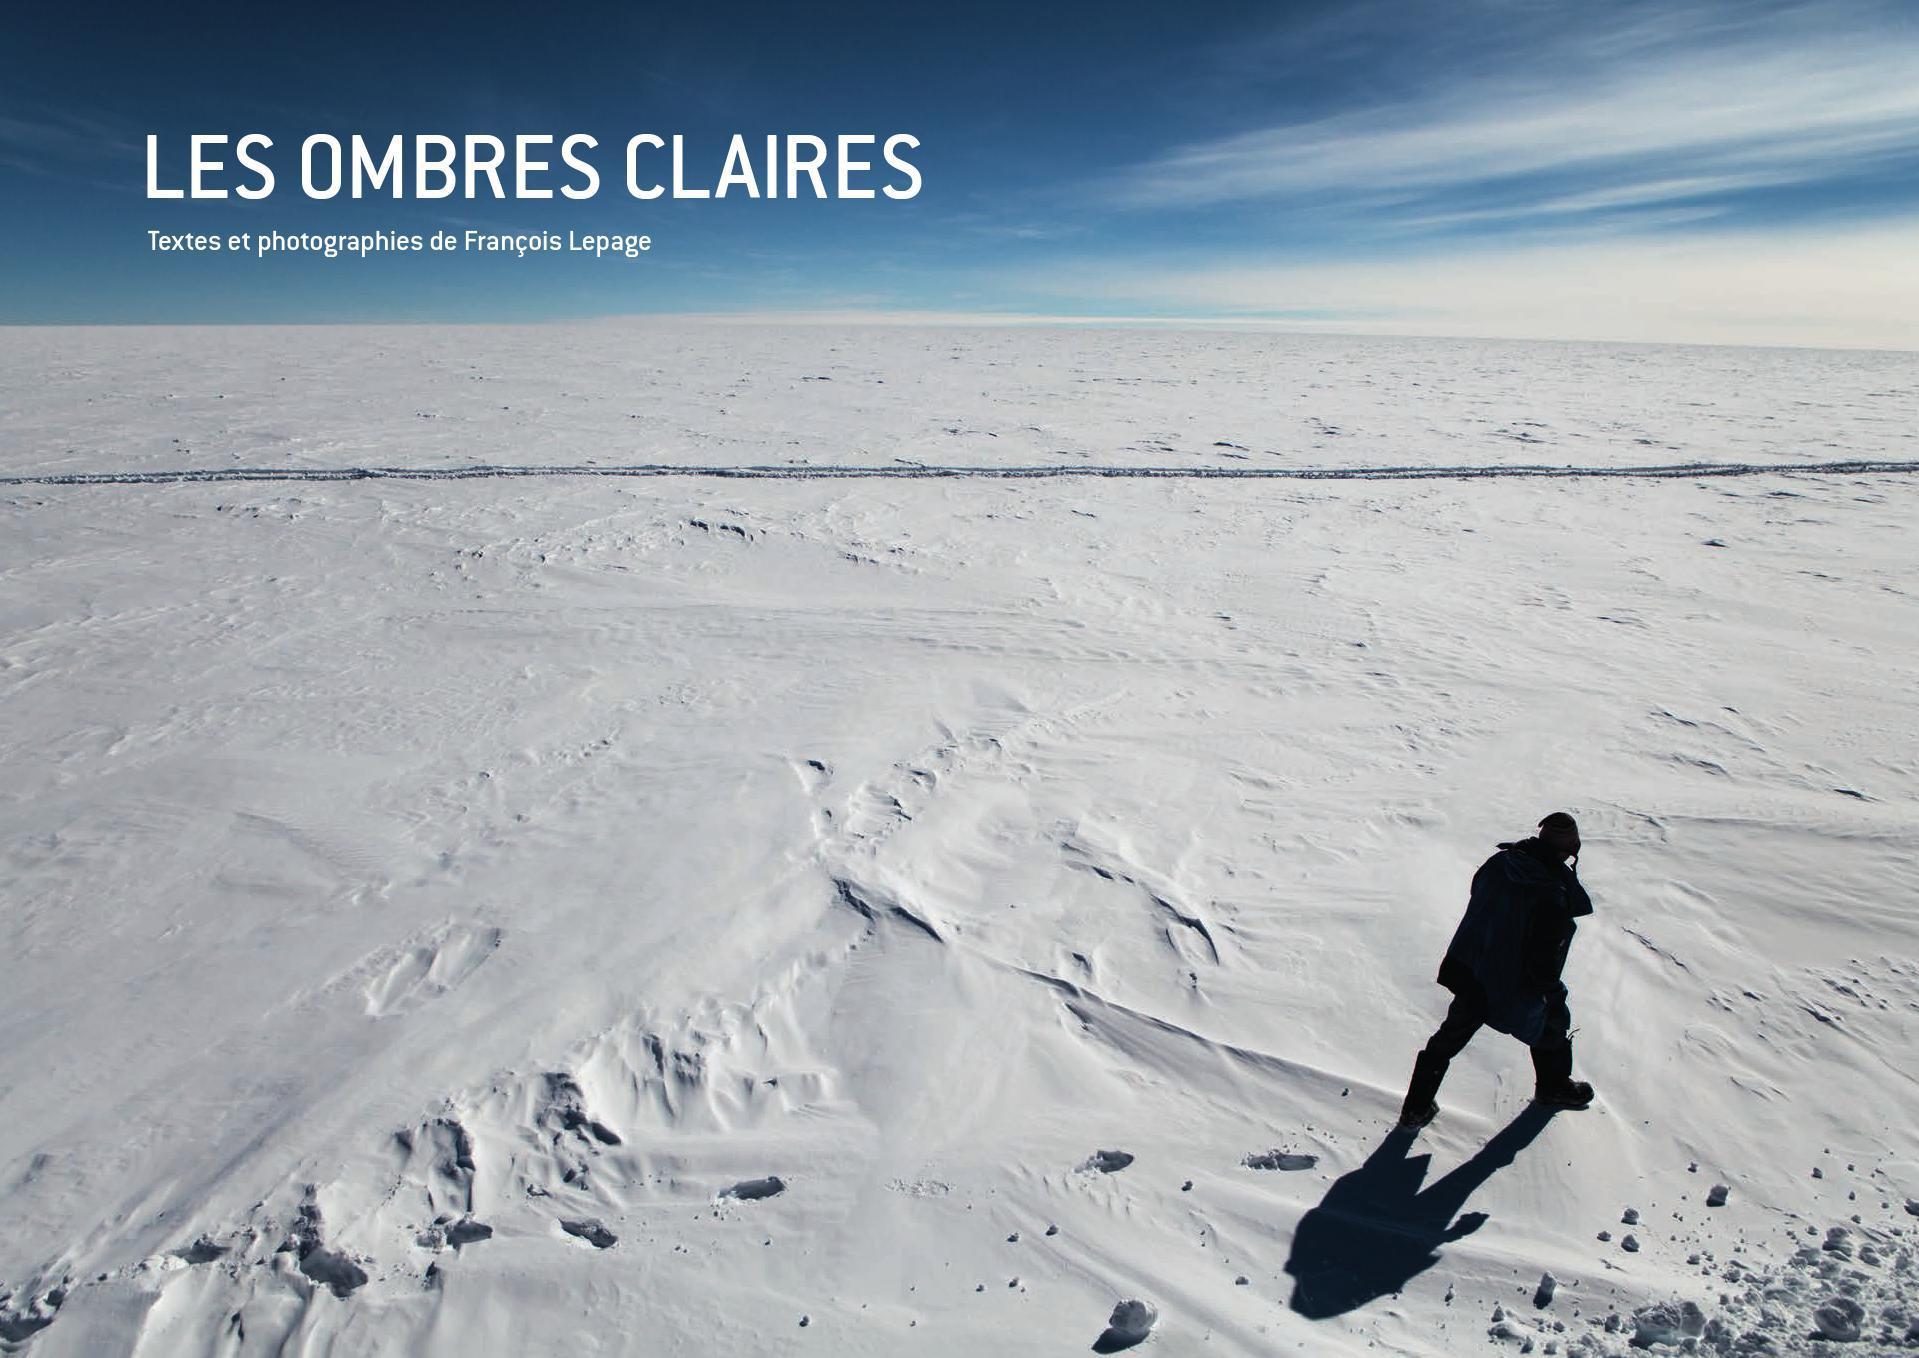 LES OMBRES CLAIRES